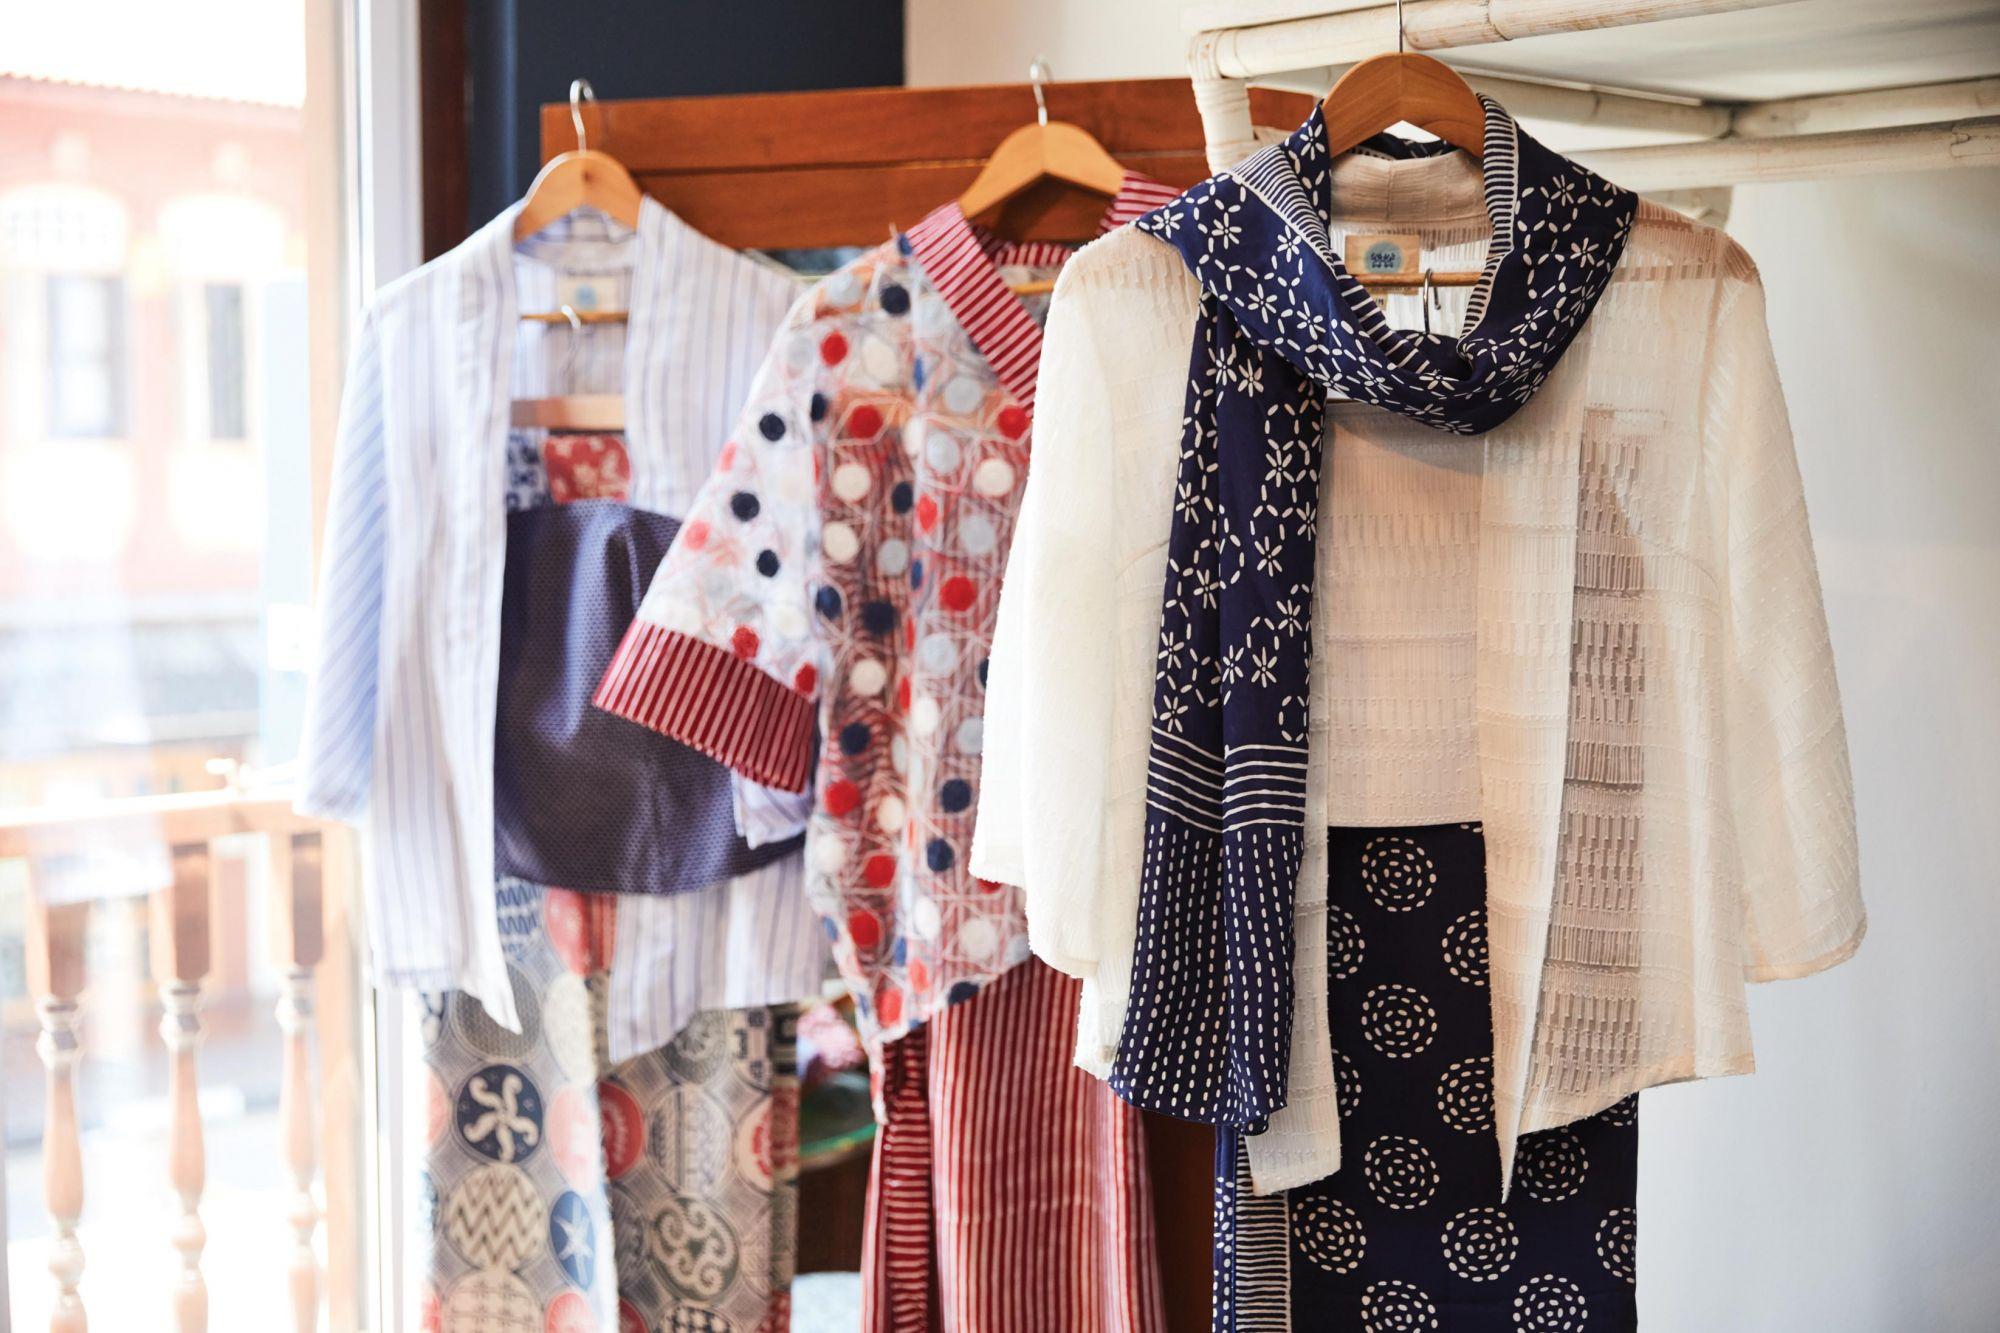 Oniatta Effendi on Weaving Heritage Stories with Singapore Batik Label Baju by Oniatta